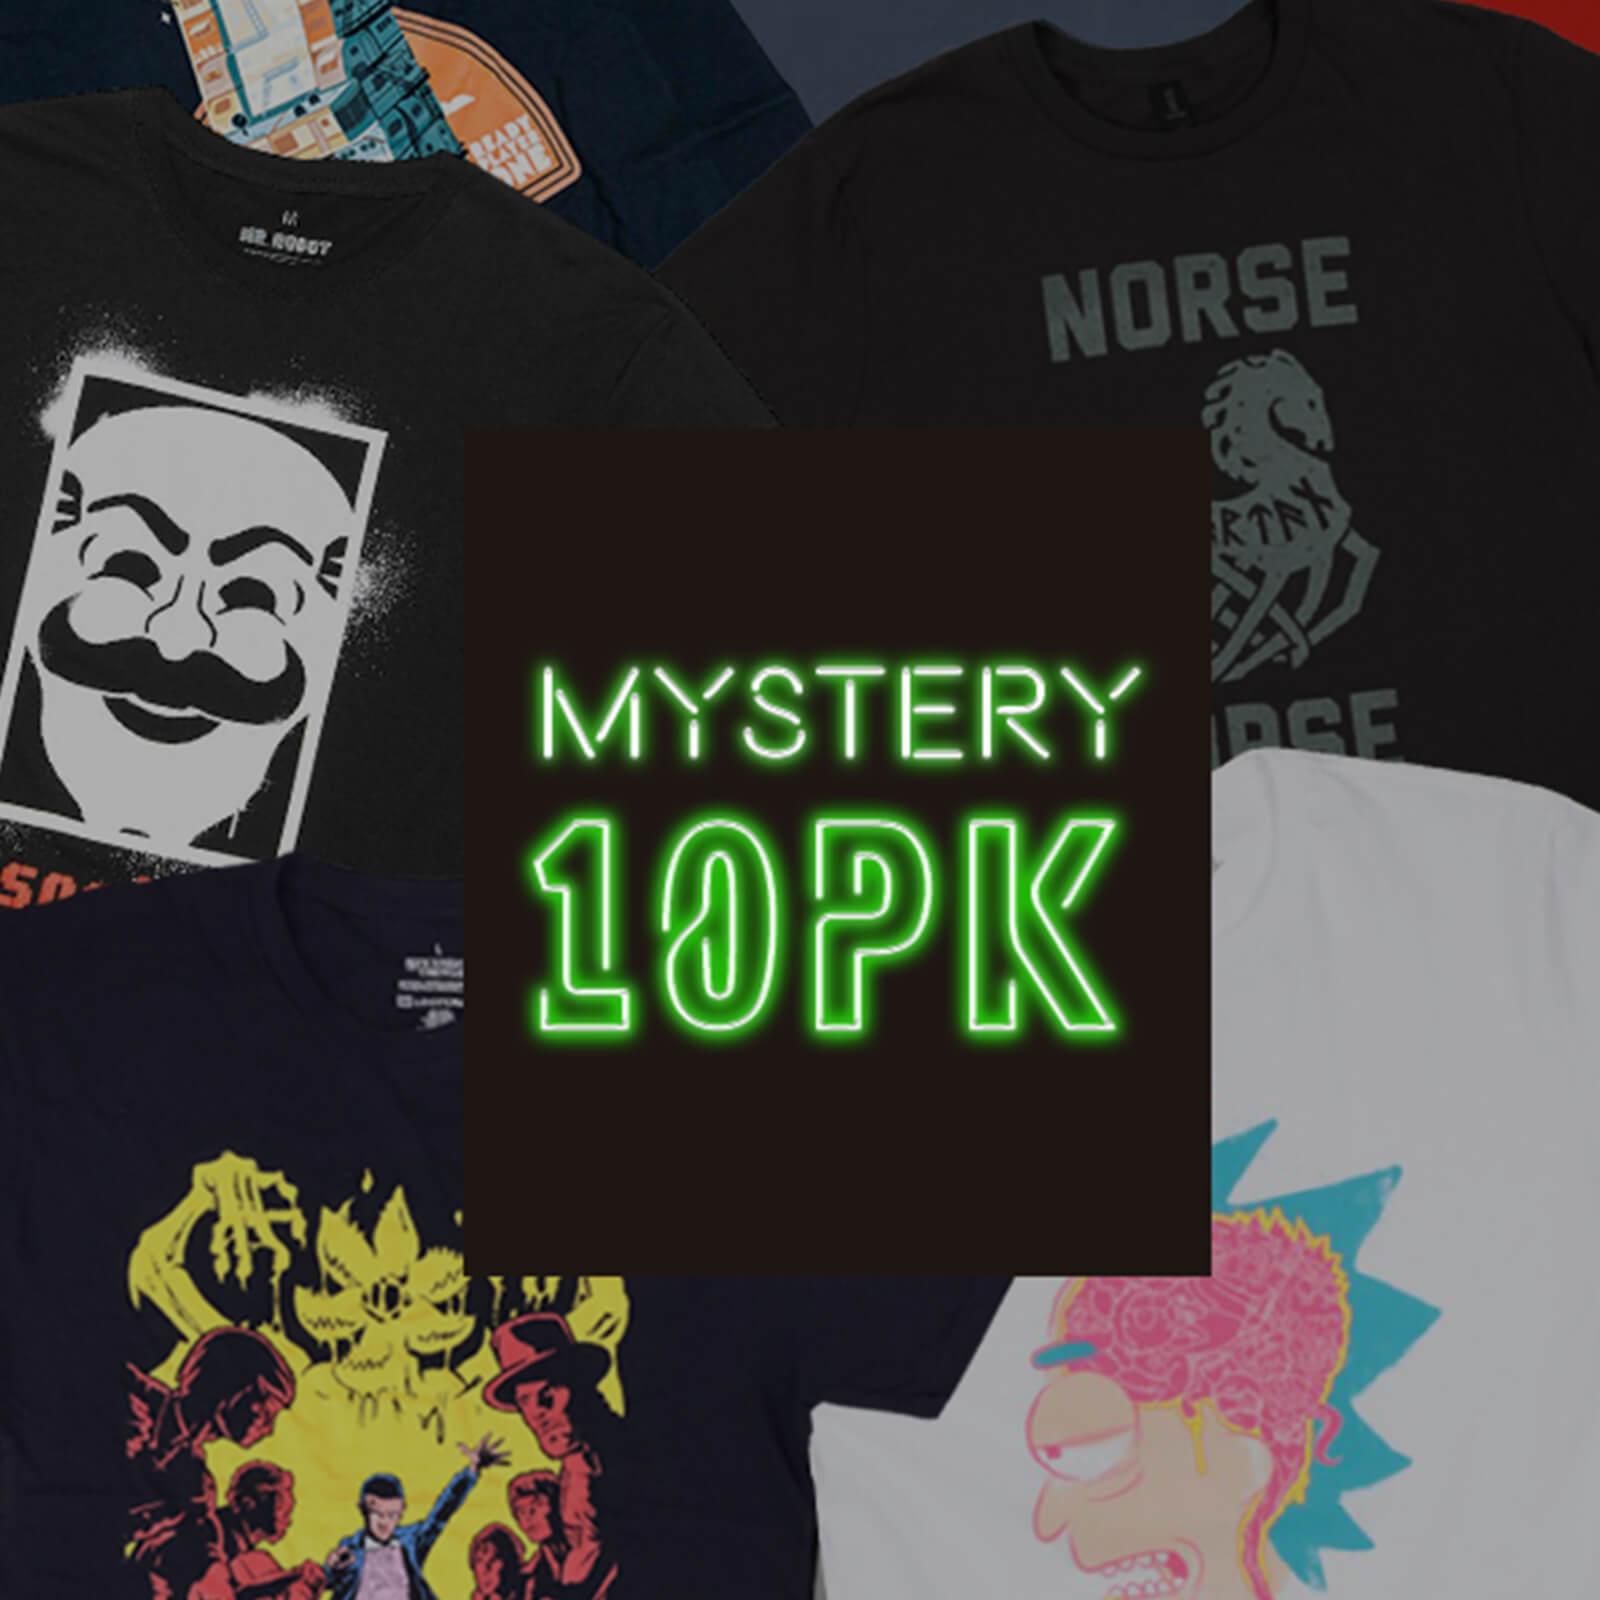 10 Camisetas misteriosas por 29,99